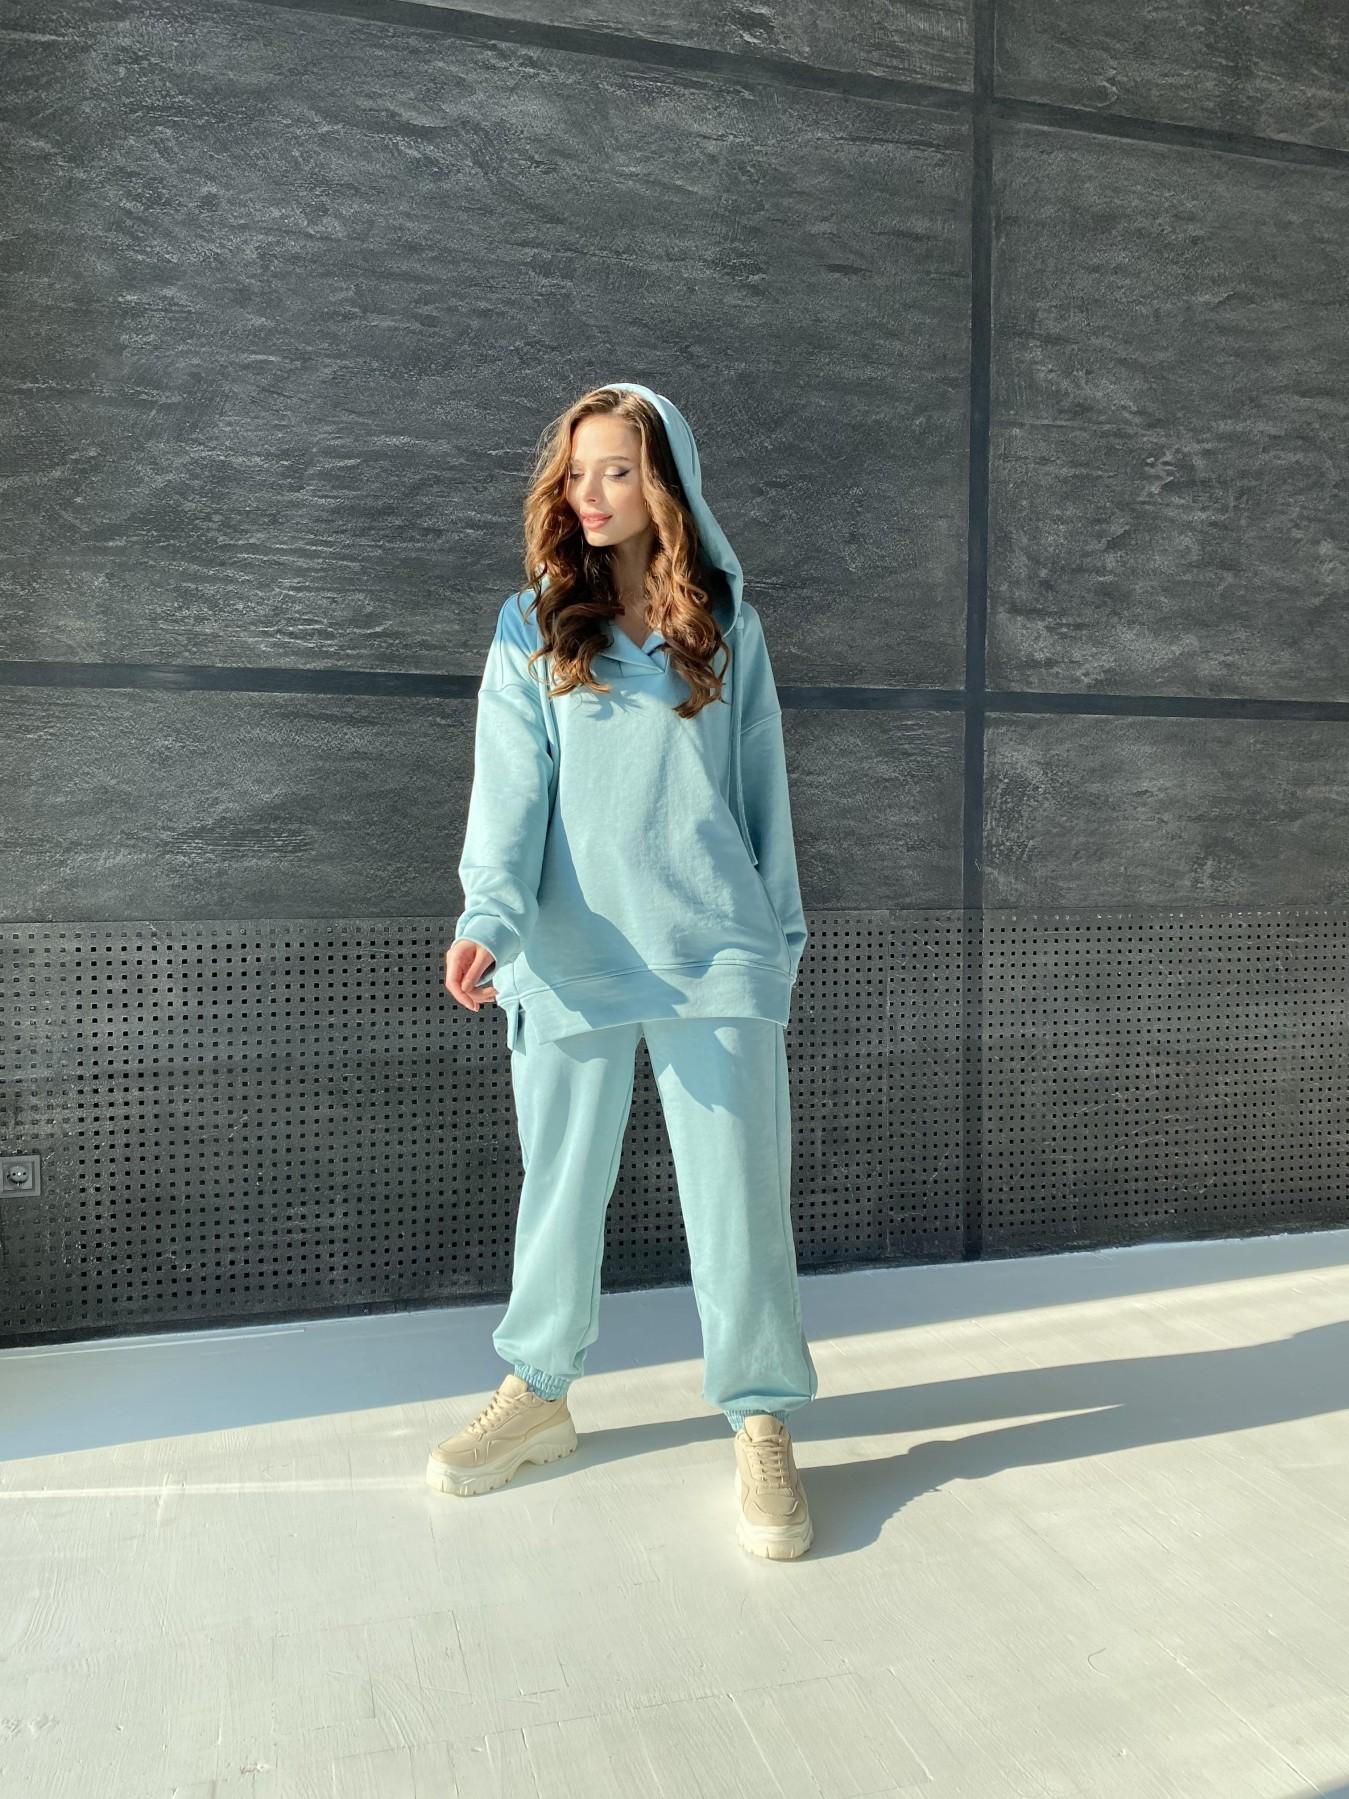 Ярис костюм из 3х нитки 10789 АРТ. 47264 Цвет: Олива - фото 1, интернет магазин tm-modus.ru